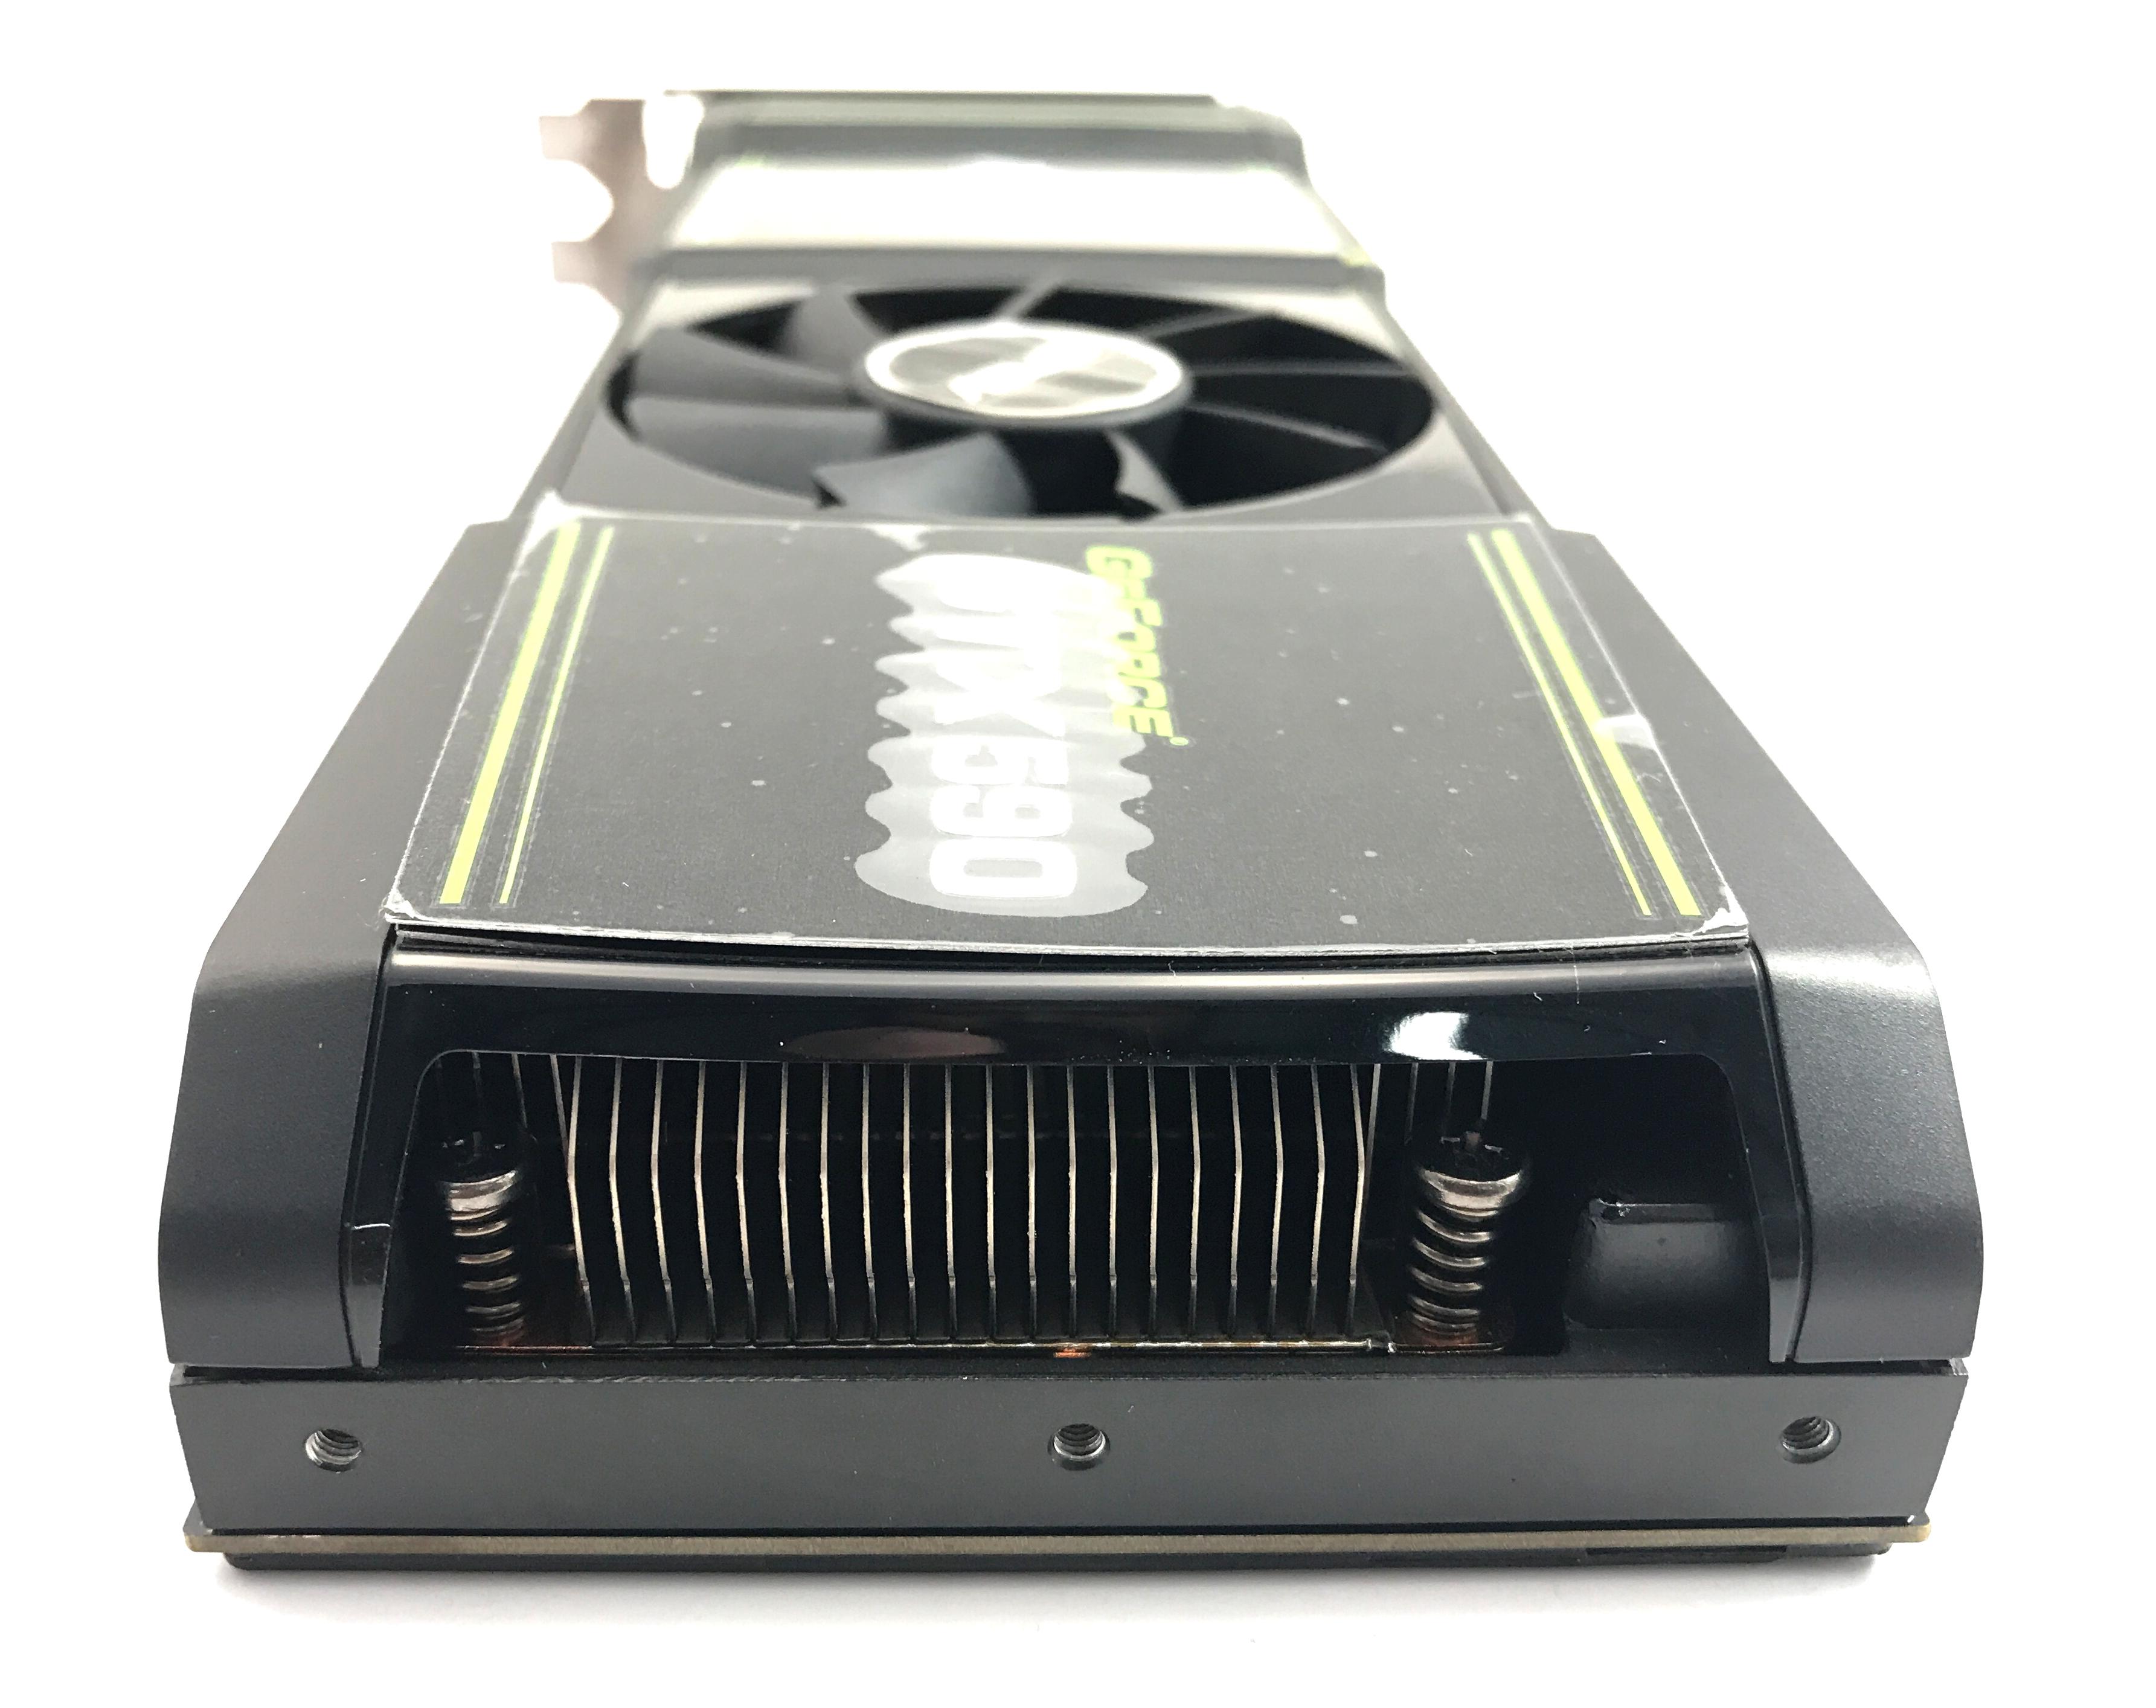 Asus GTX 590 Dual Gpu 3Gb GDDR5 Memory Graphics Card (ENGTX590)